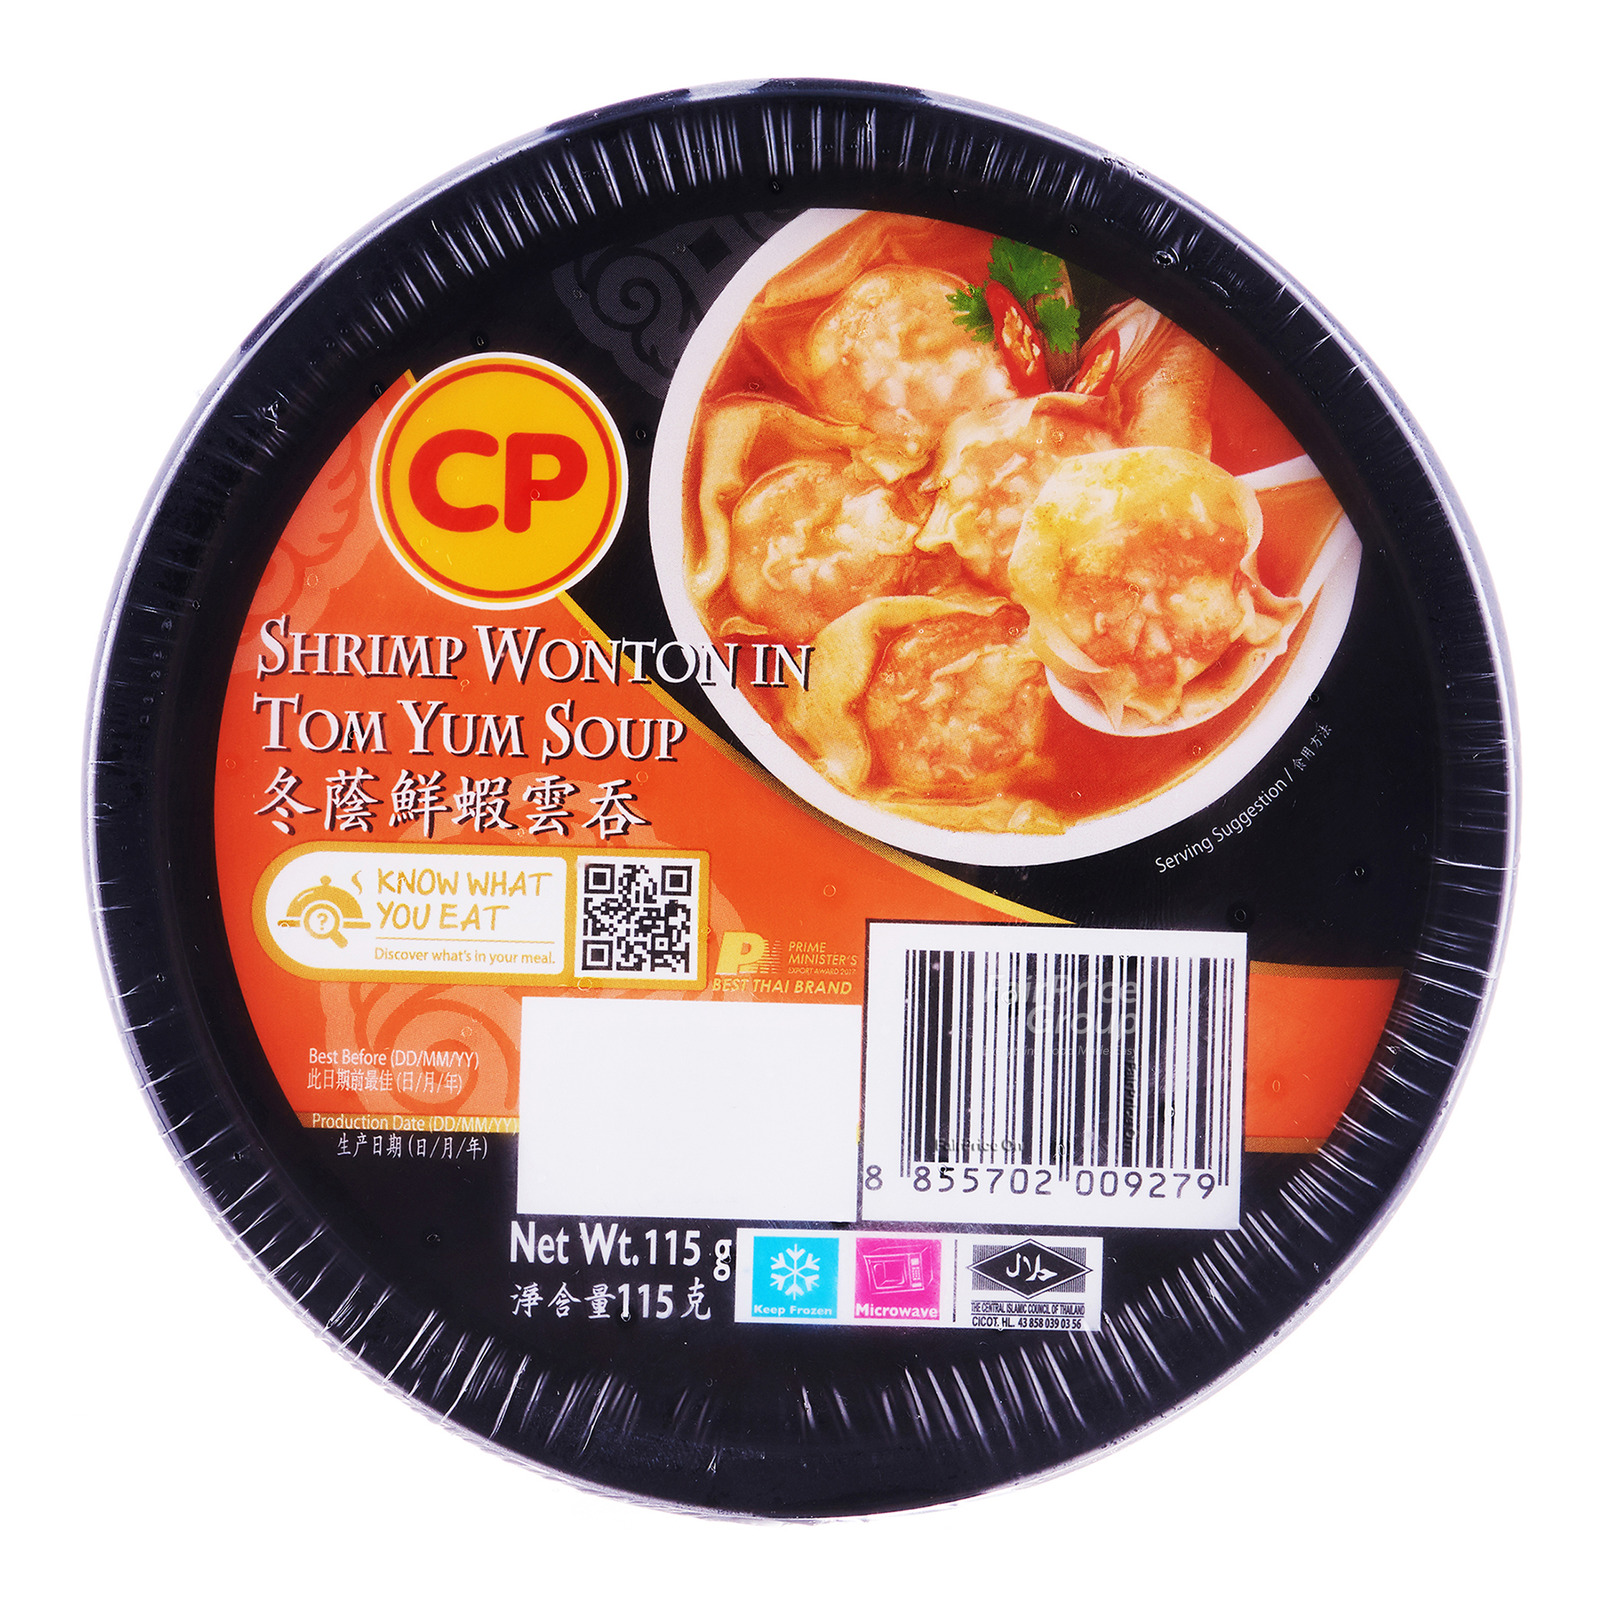 CP Shrimp Wonton in Tom Yum Soup (Bowl)